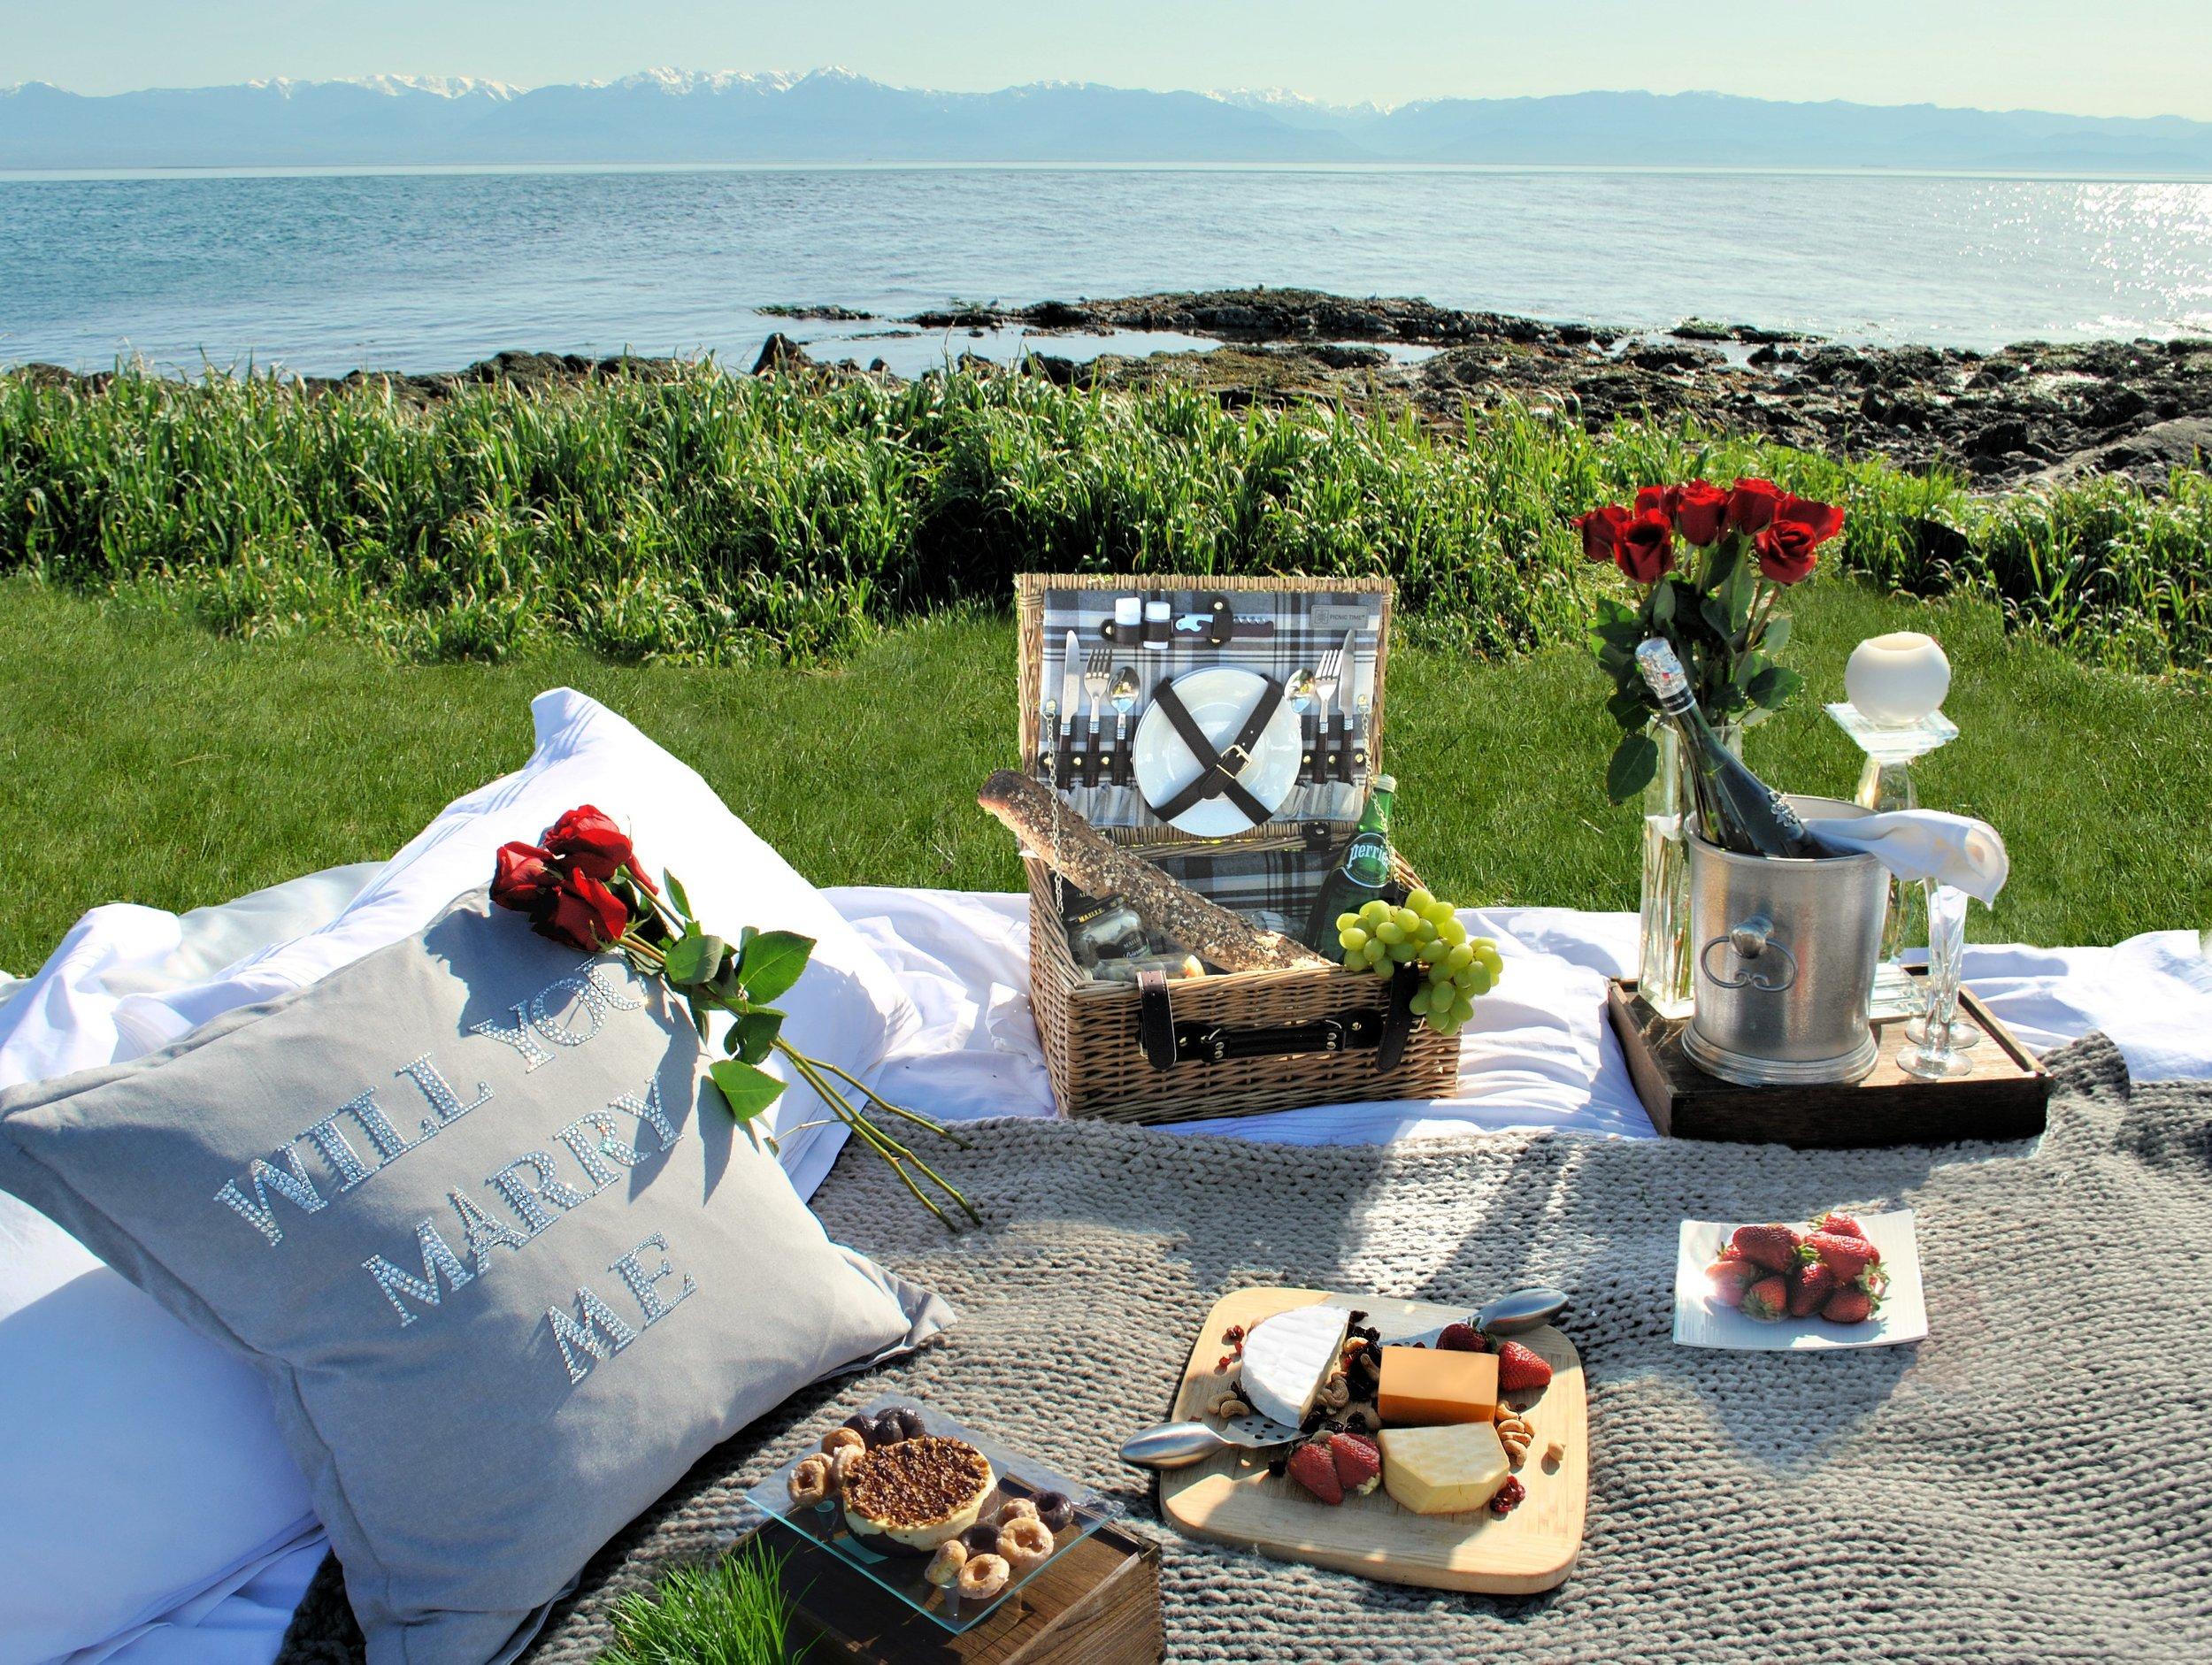 Romantic Picnic Marriage Proposal